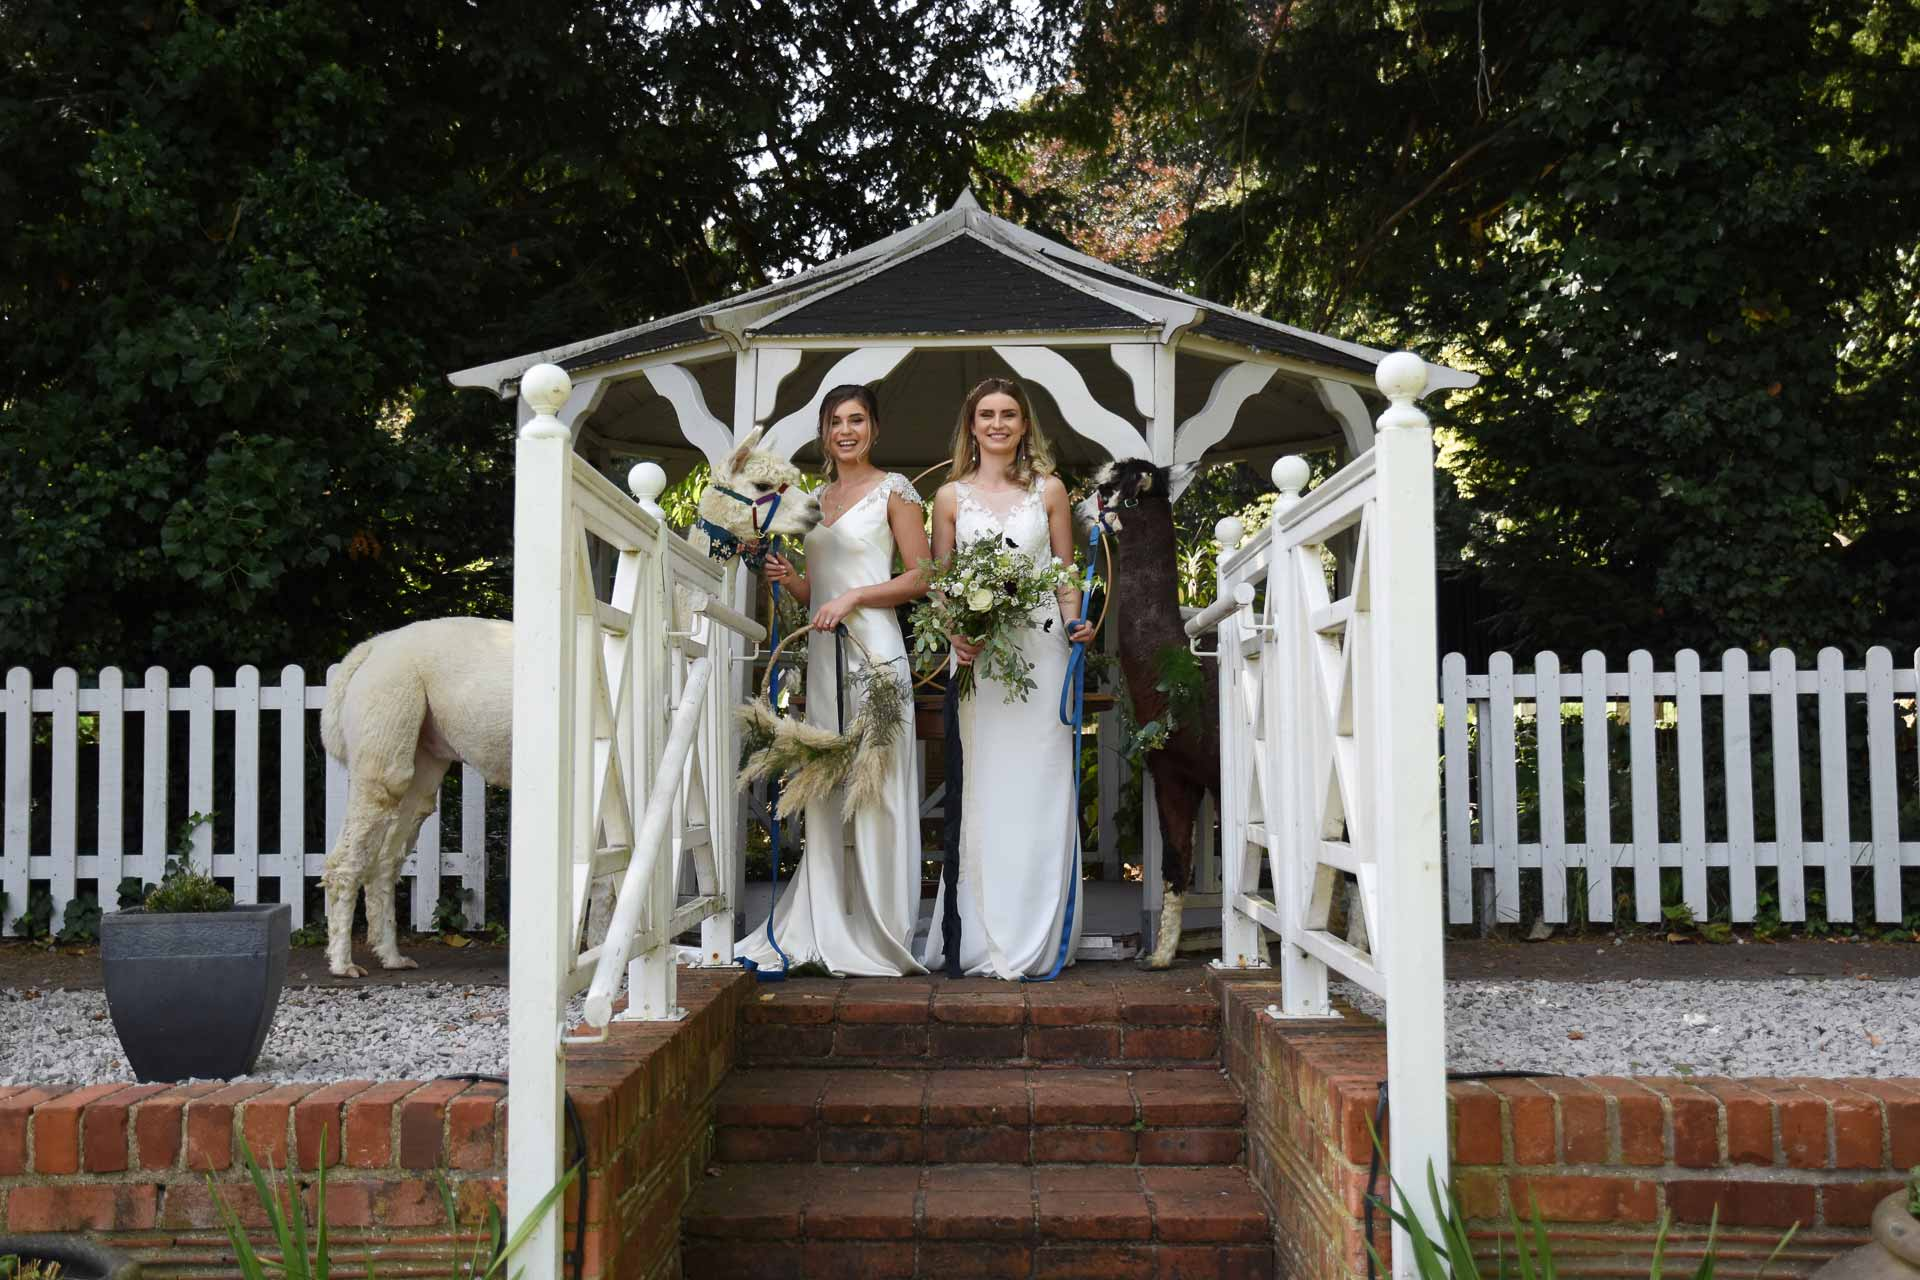 fun luxury wedding at the Elephant Hotel, Pangbourne